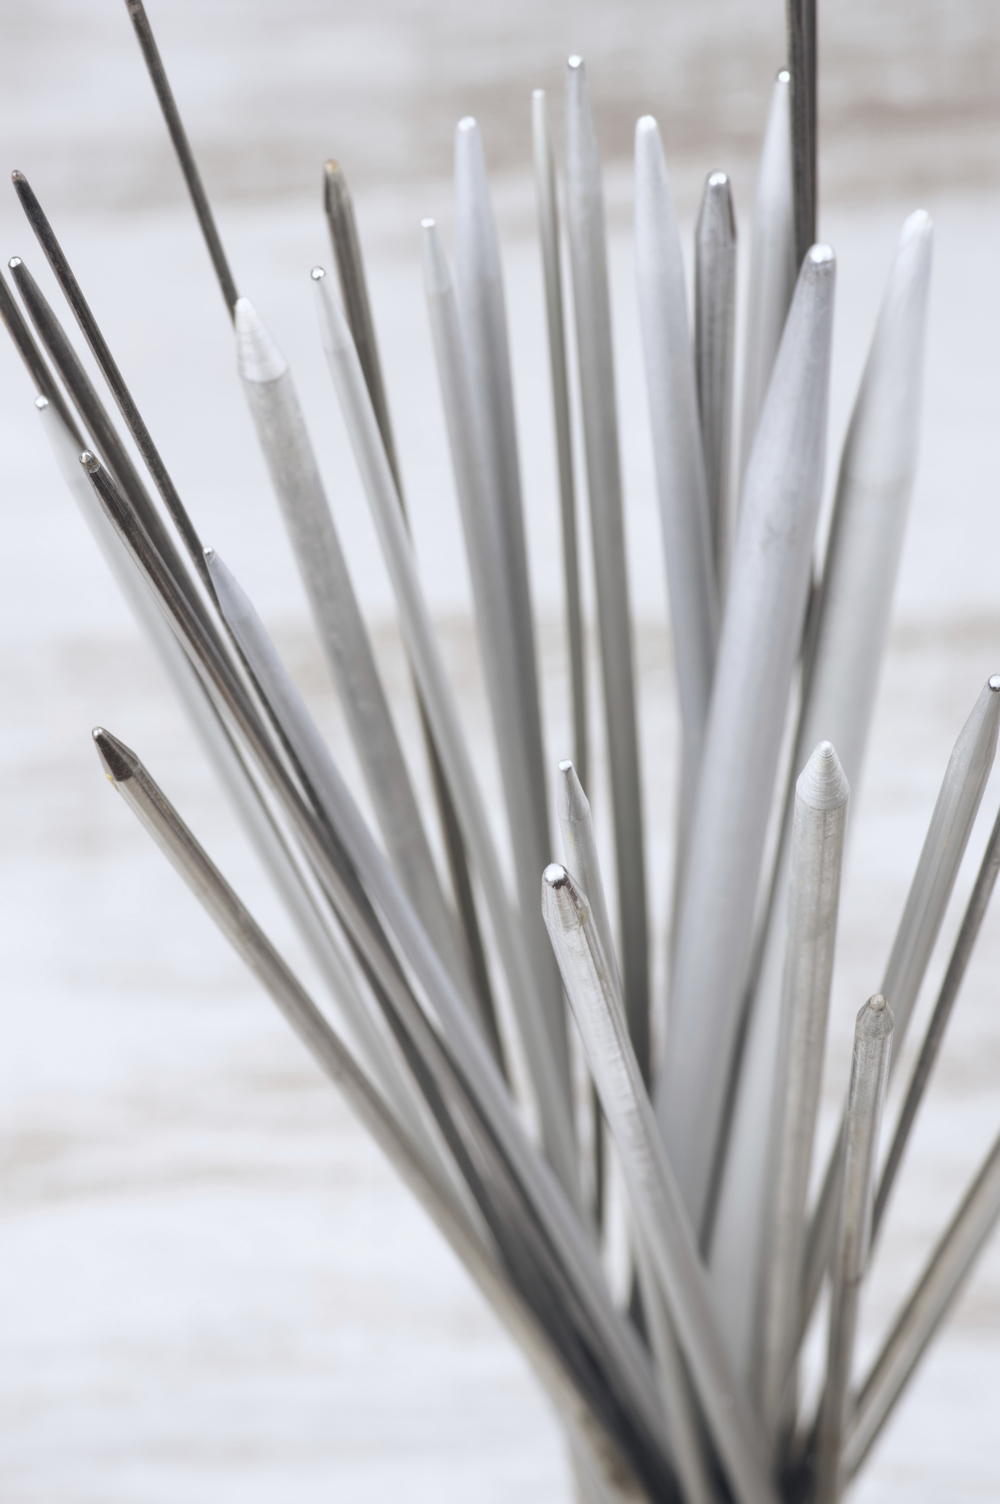 stock-photo-52654442-bunch-of-knitting-needles.jpg